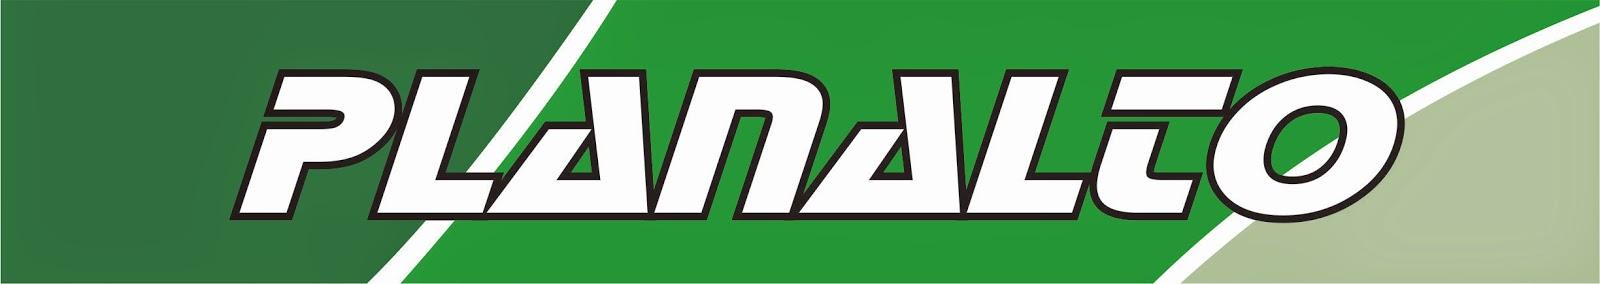 http://onibus-mania.blogspot.com.br/search/label/Transportes%20Planalto%20%28RJ%29